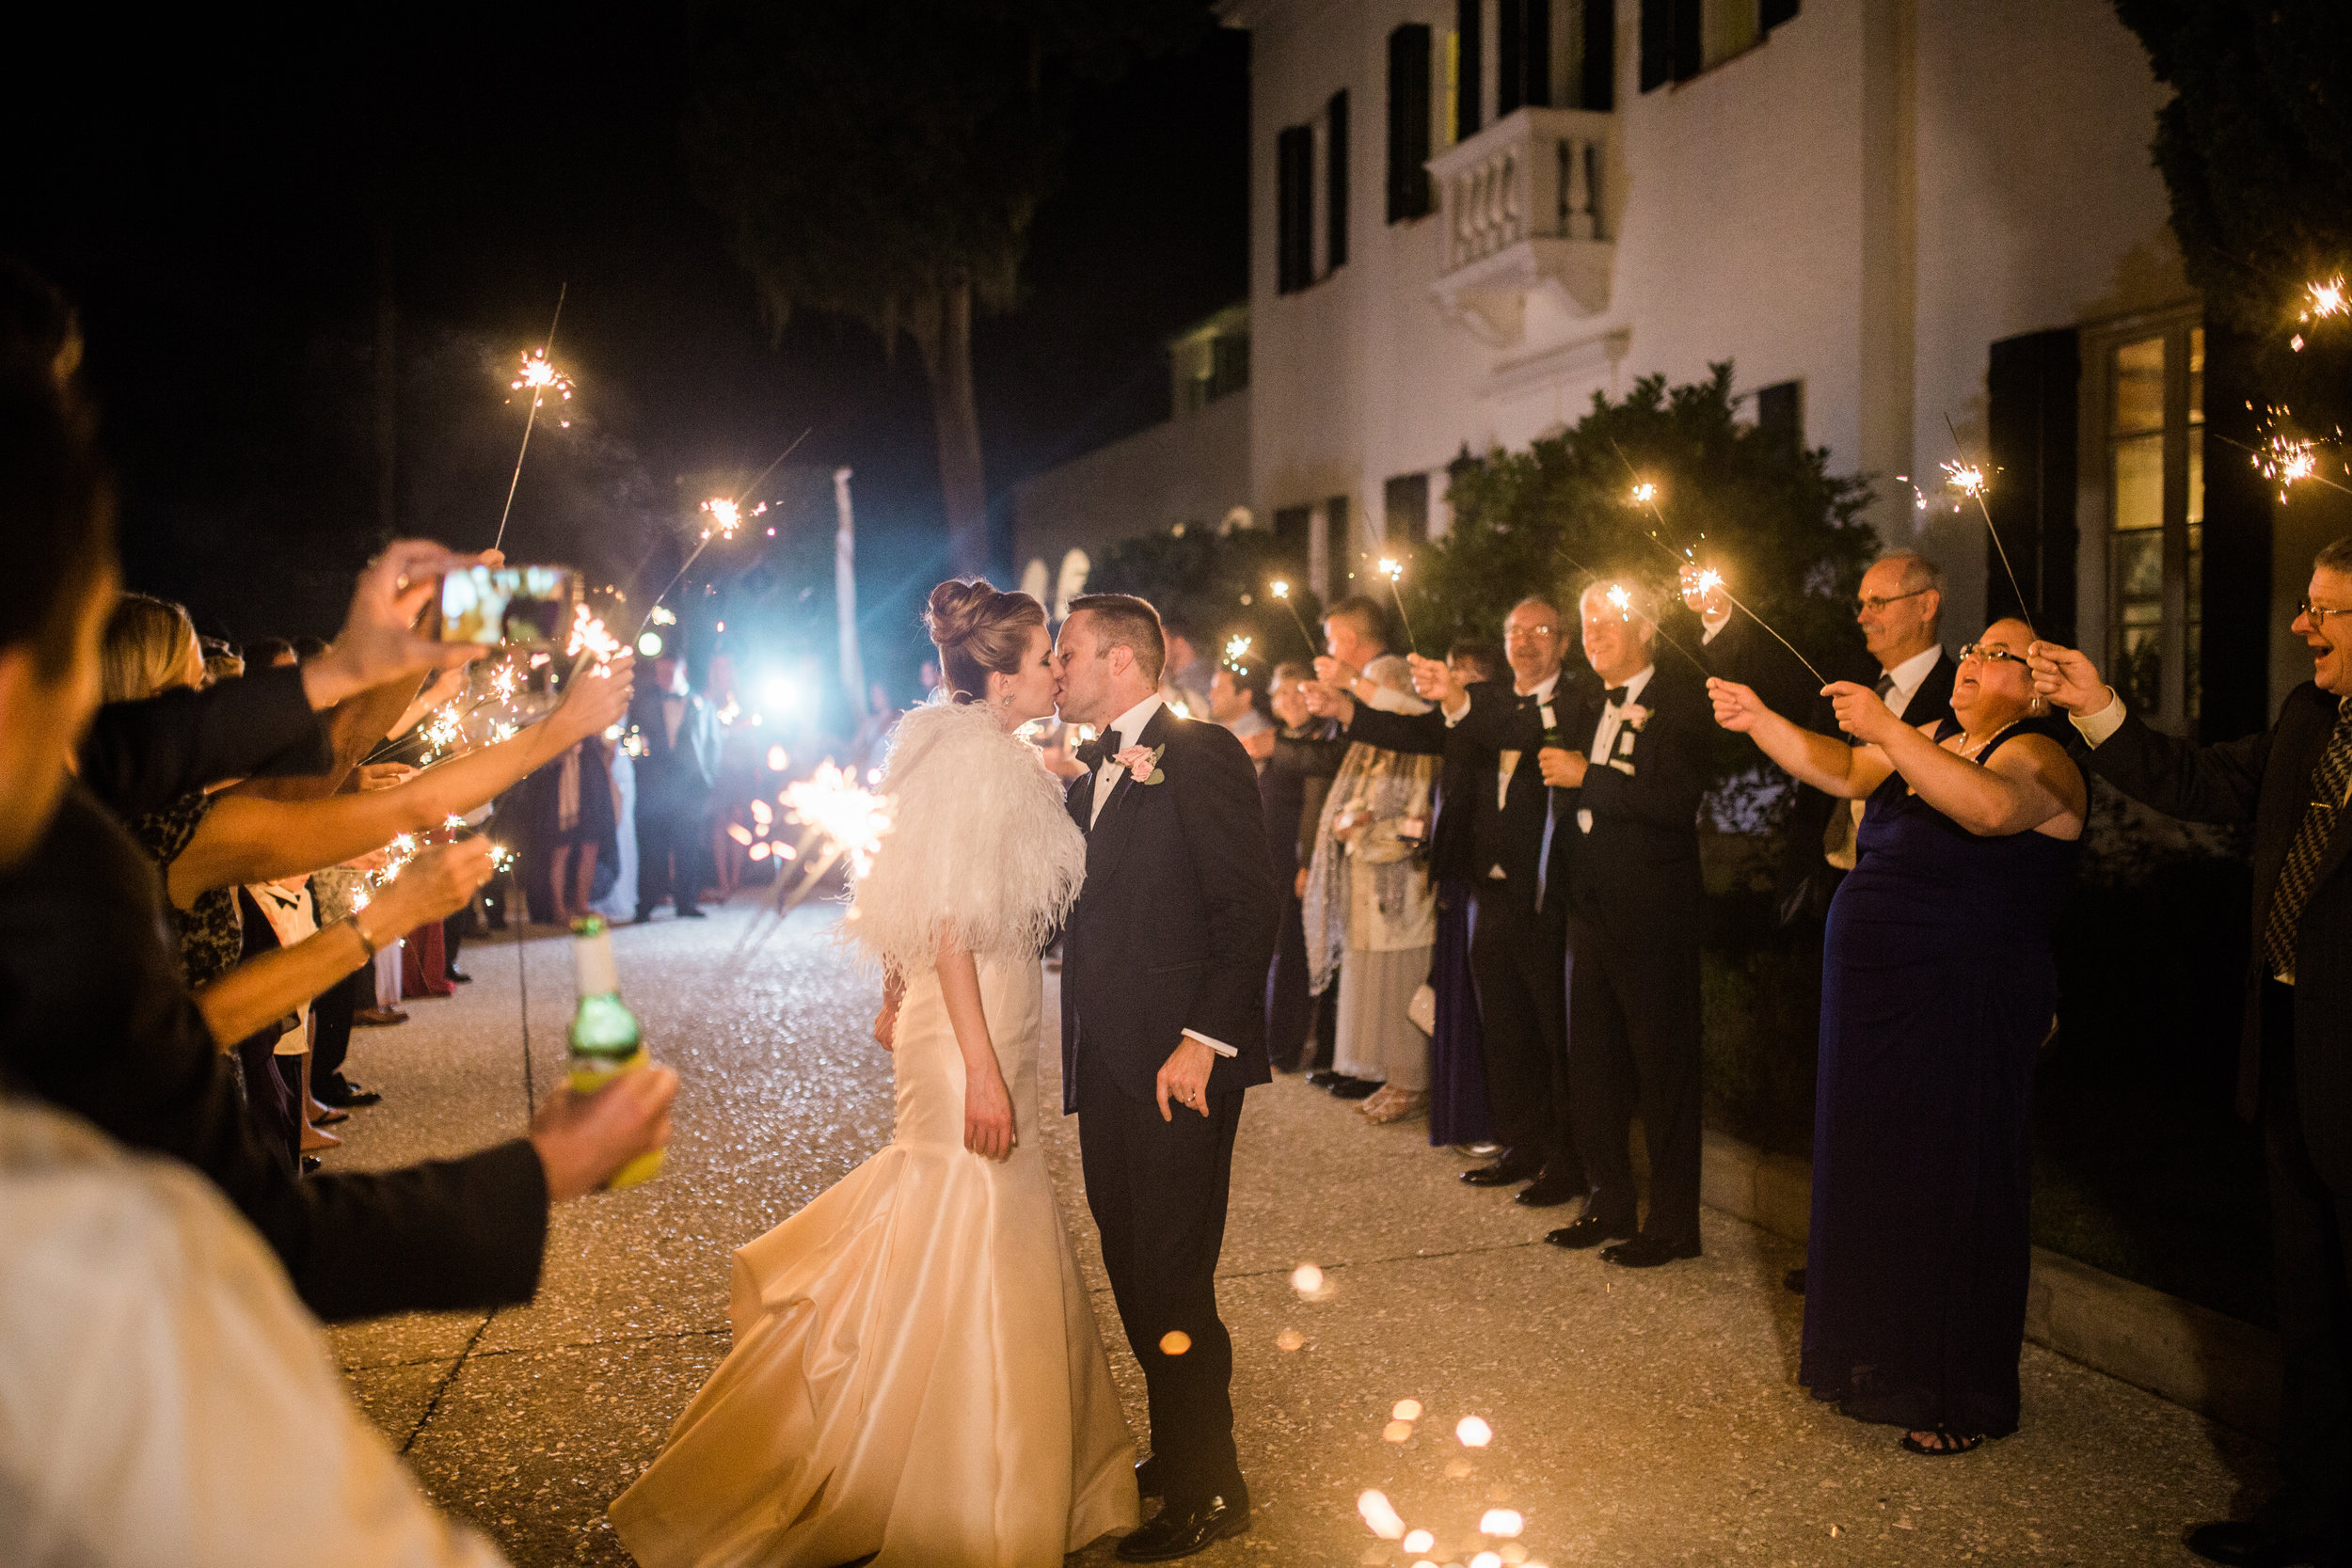 jekyll-island-resort-wedding-27.jpg